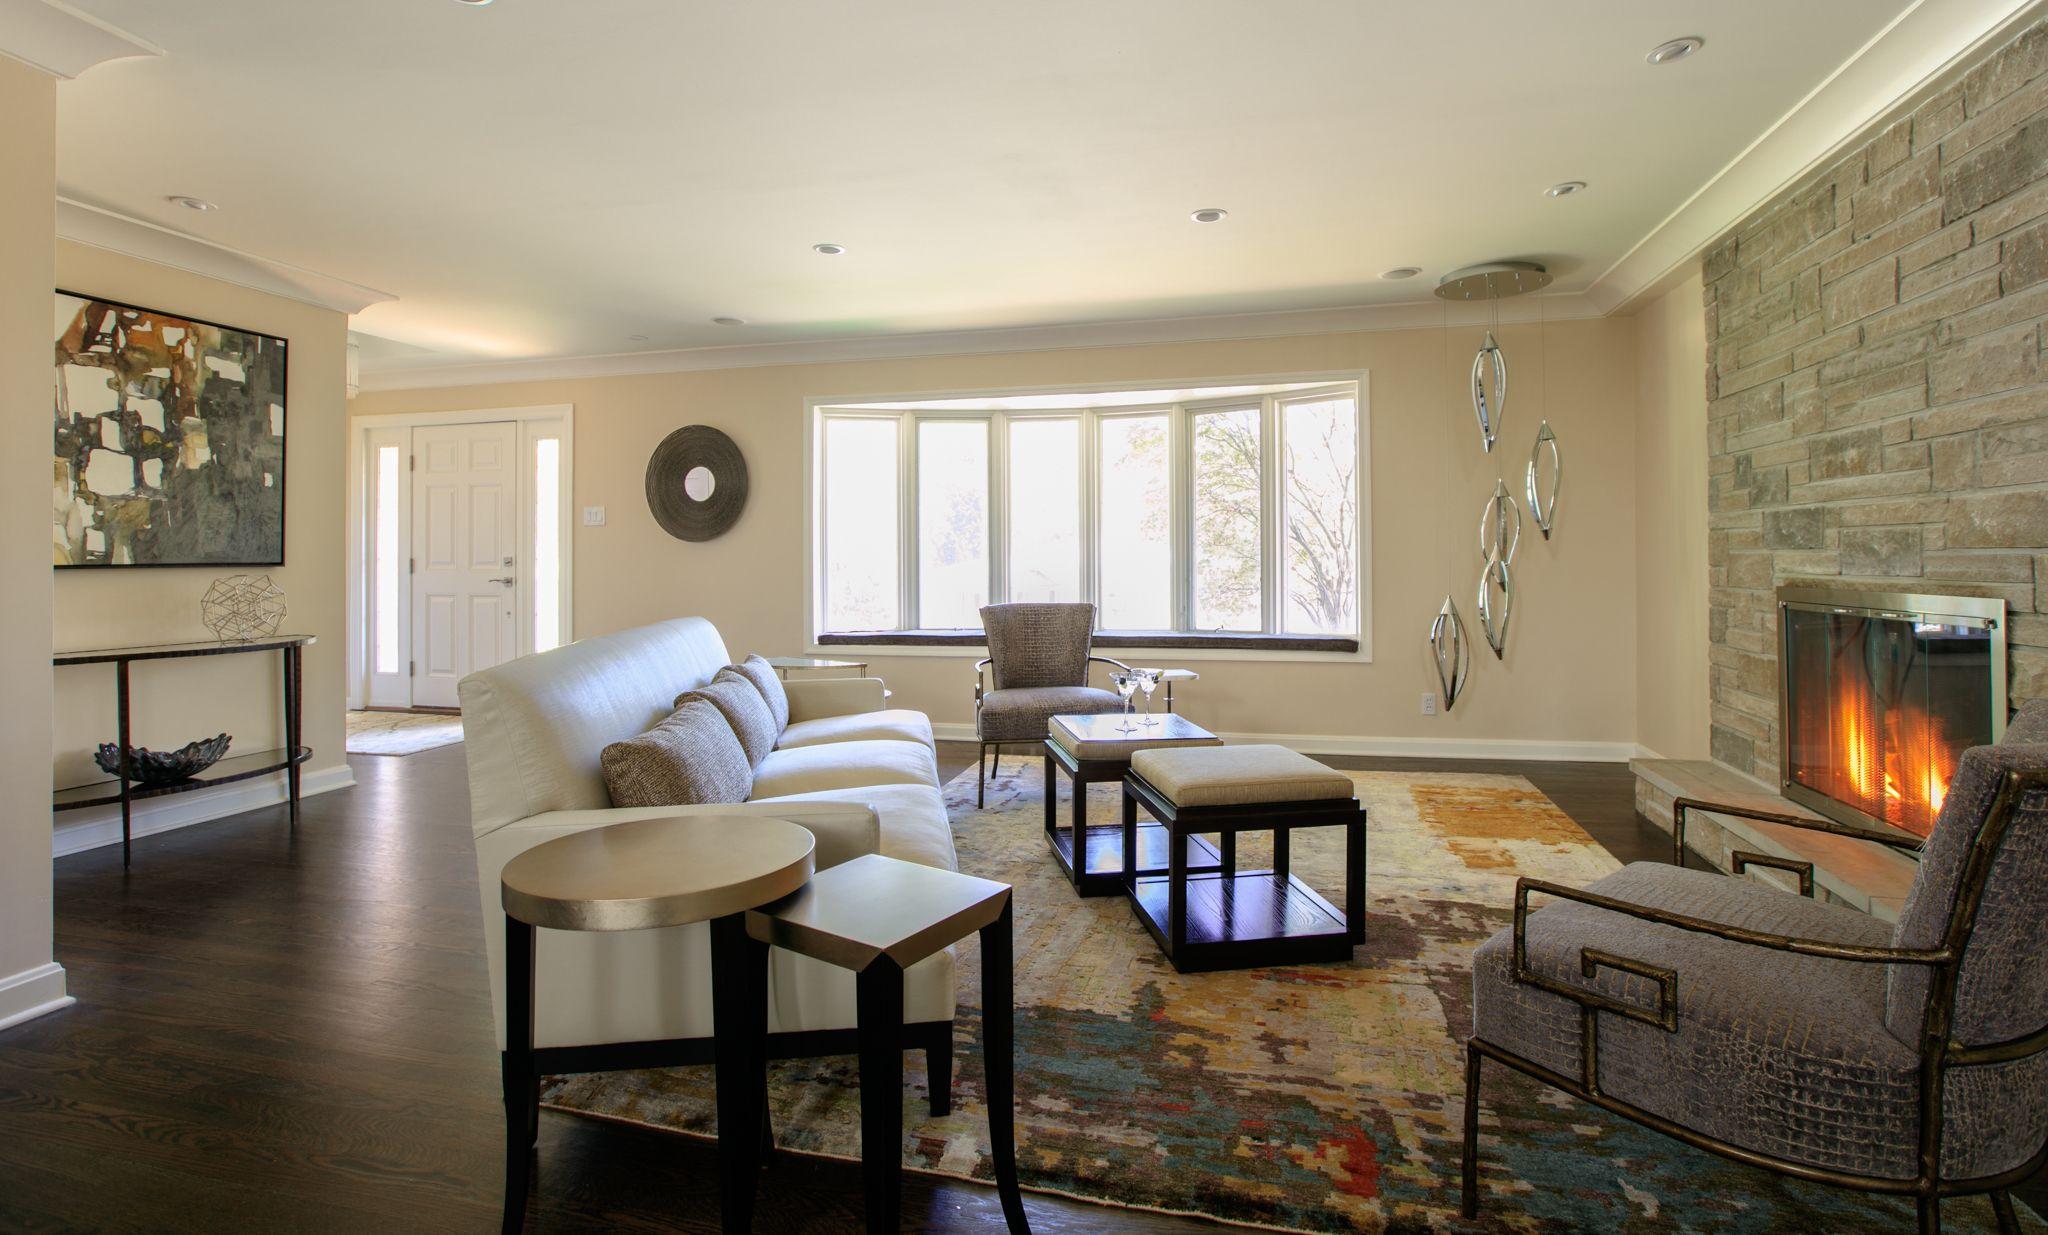 Kirkwood living room remodel photo credit suzy gorman marcia